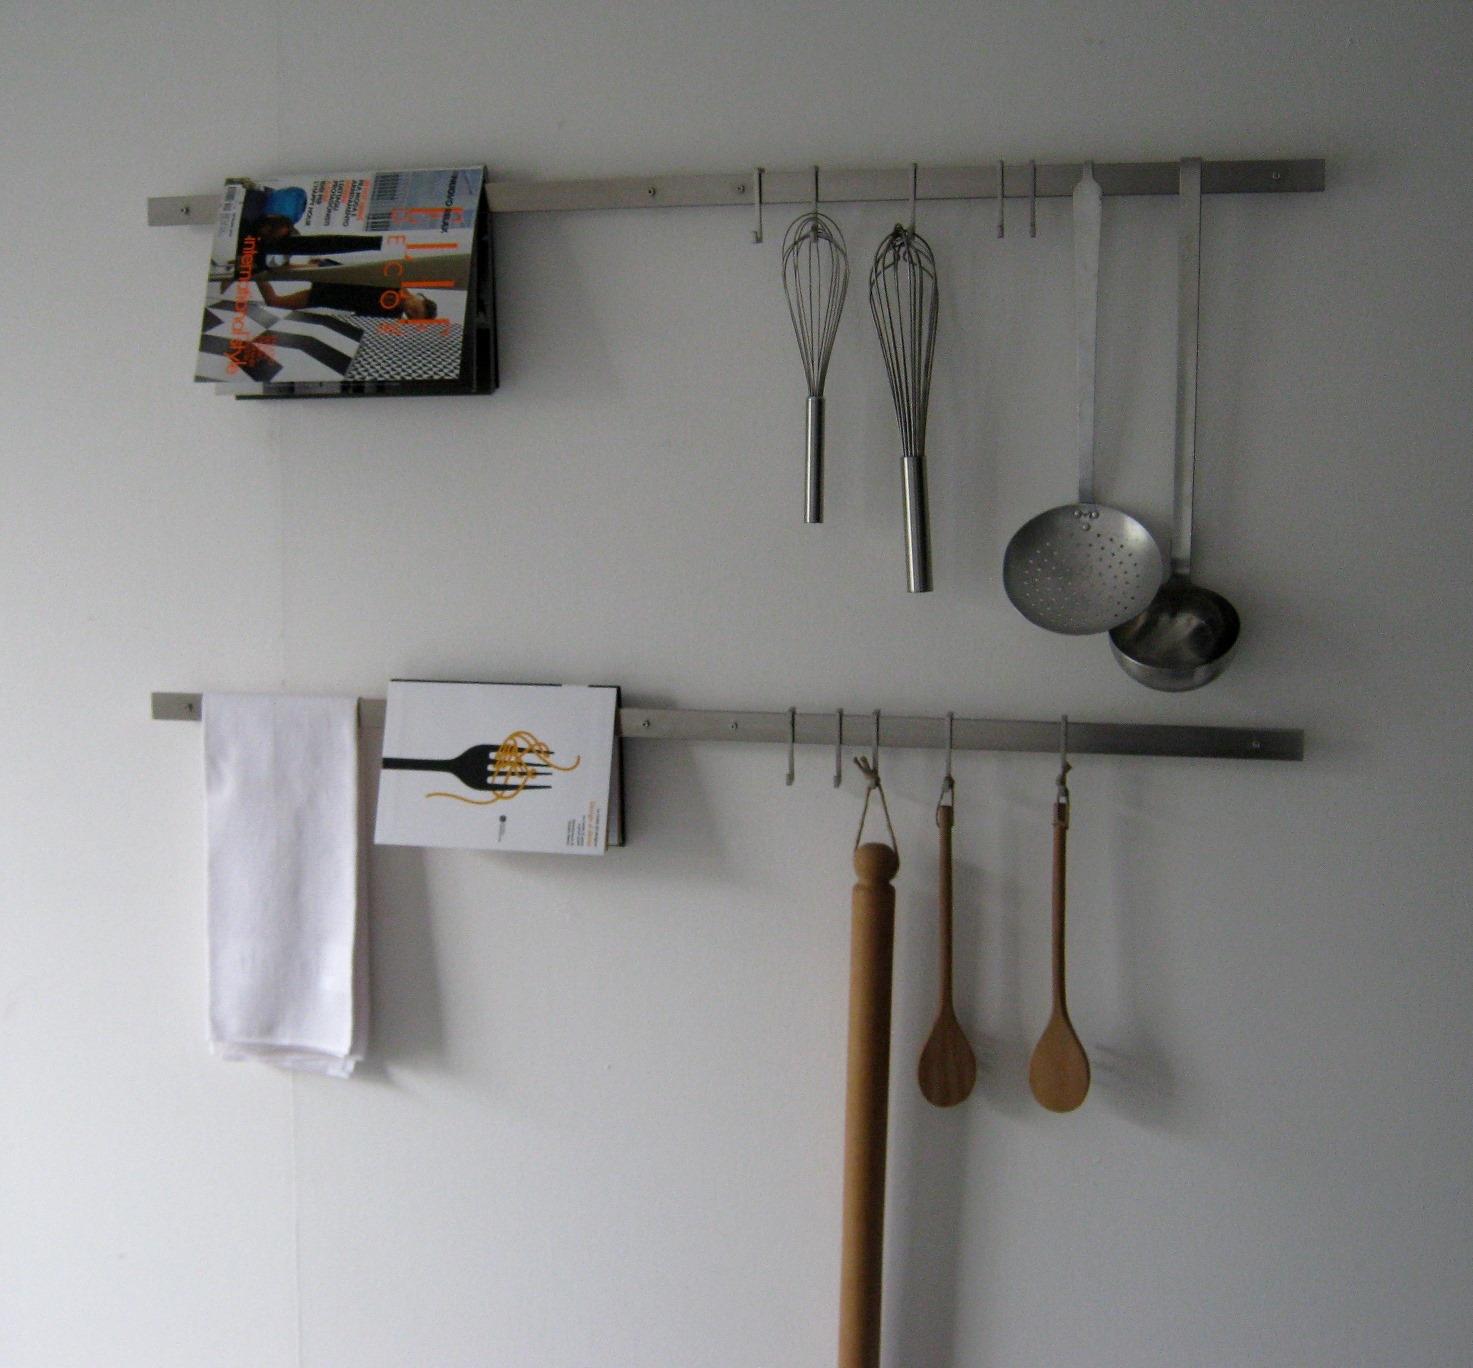 Cucina boffi outlet boffi cucine asta inox design boffi cucine a prezzi scontati - Boffi cucine prezzi ...